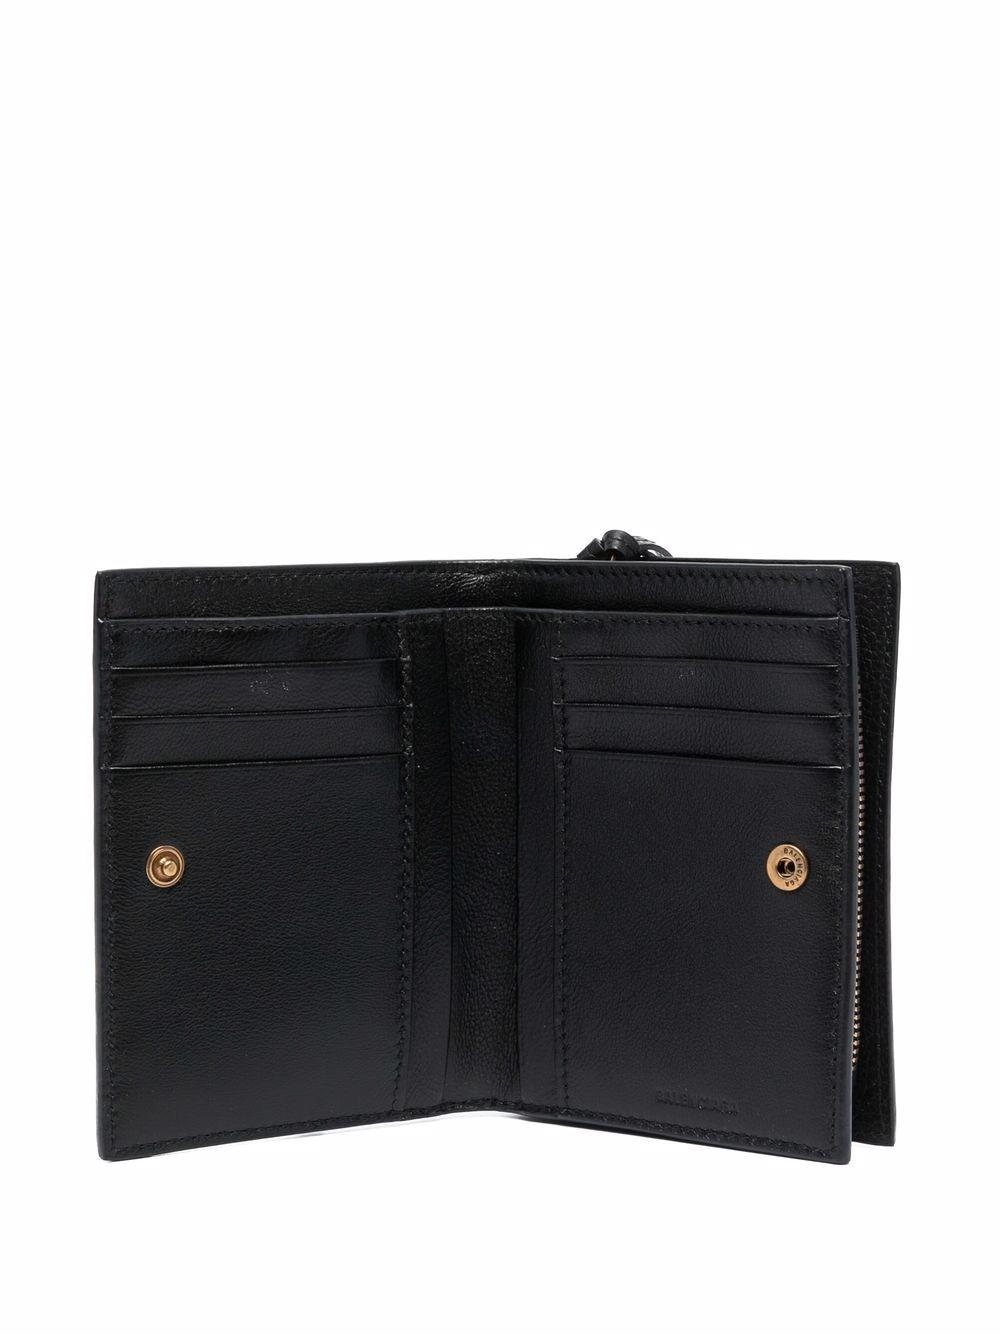 Picture of Balenciaga | Neo Compact Wallet